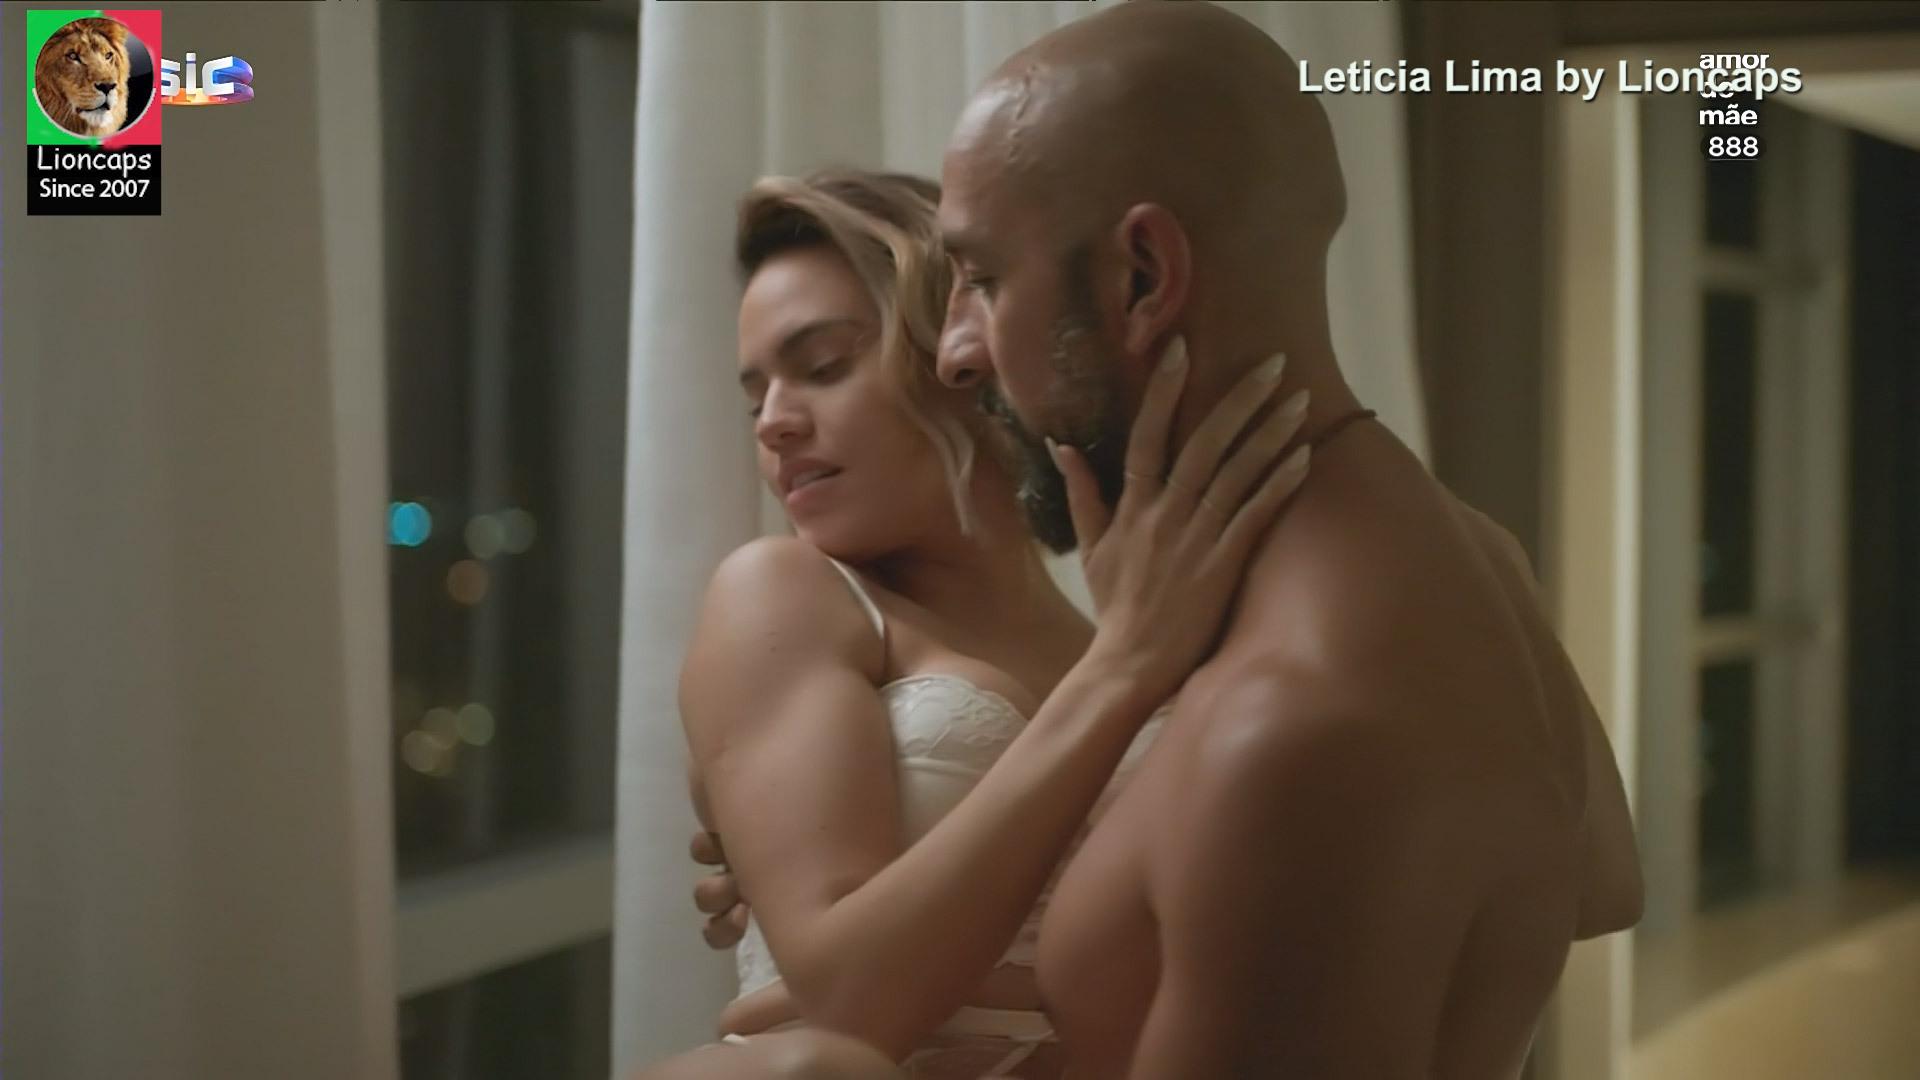 leticia_lima_amor (2).jpg